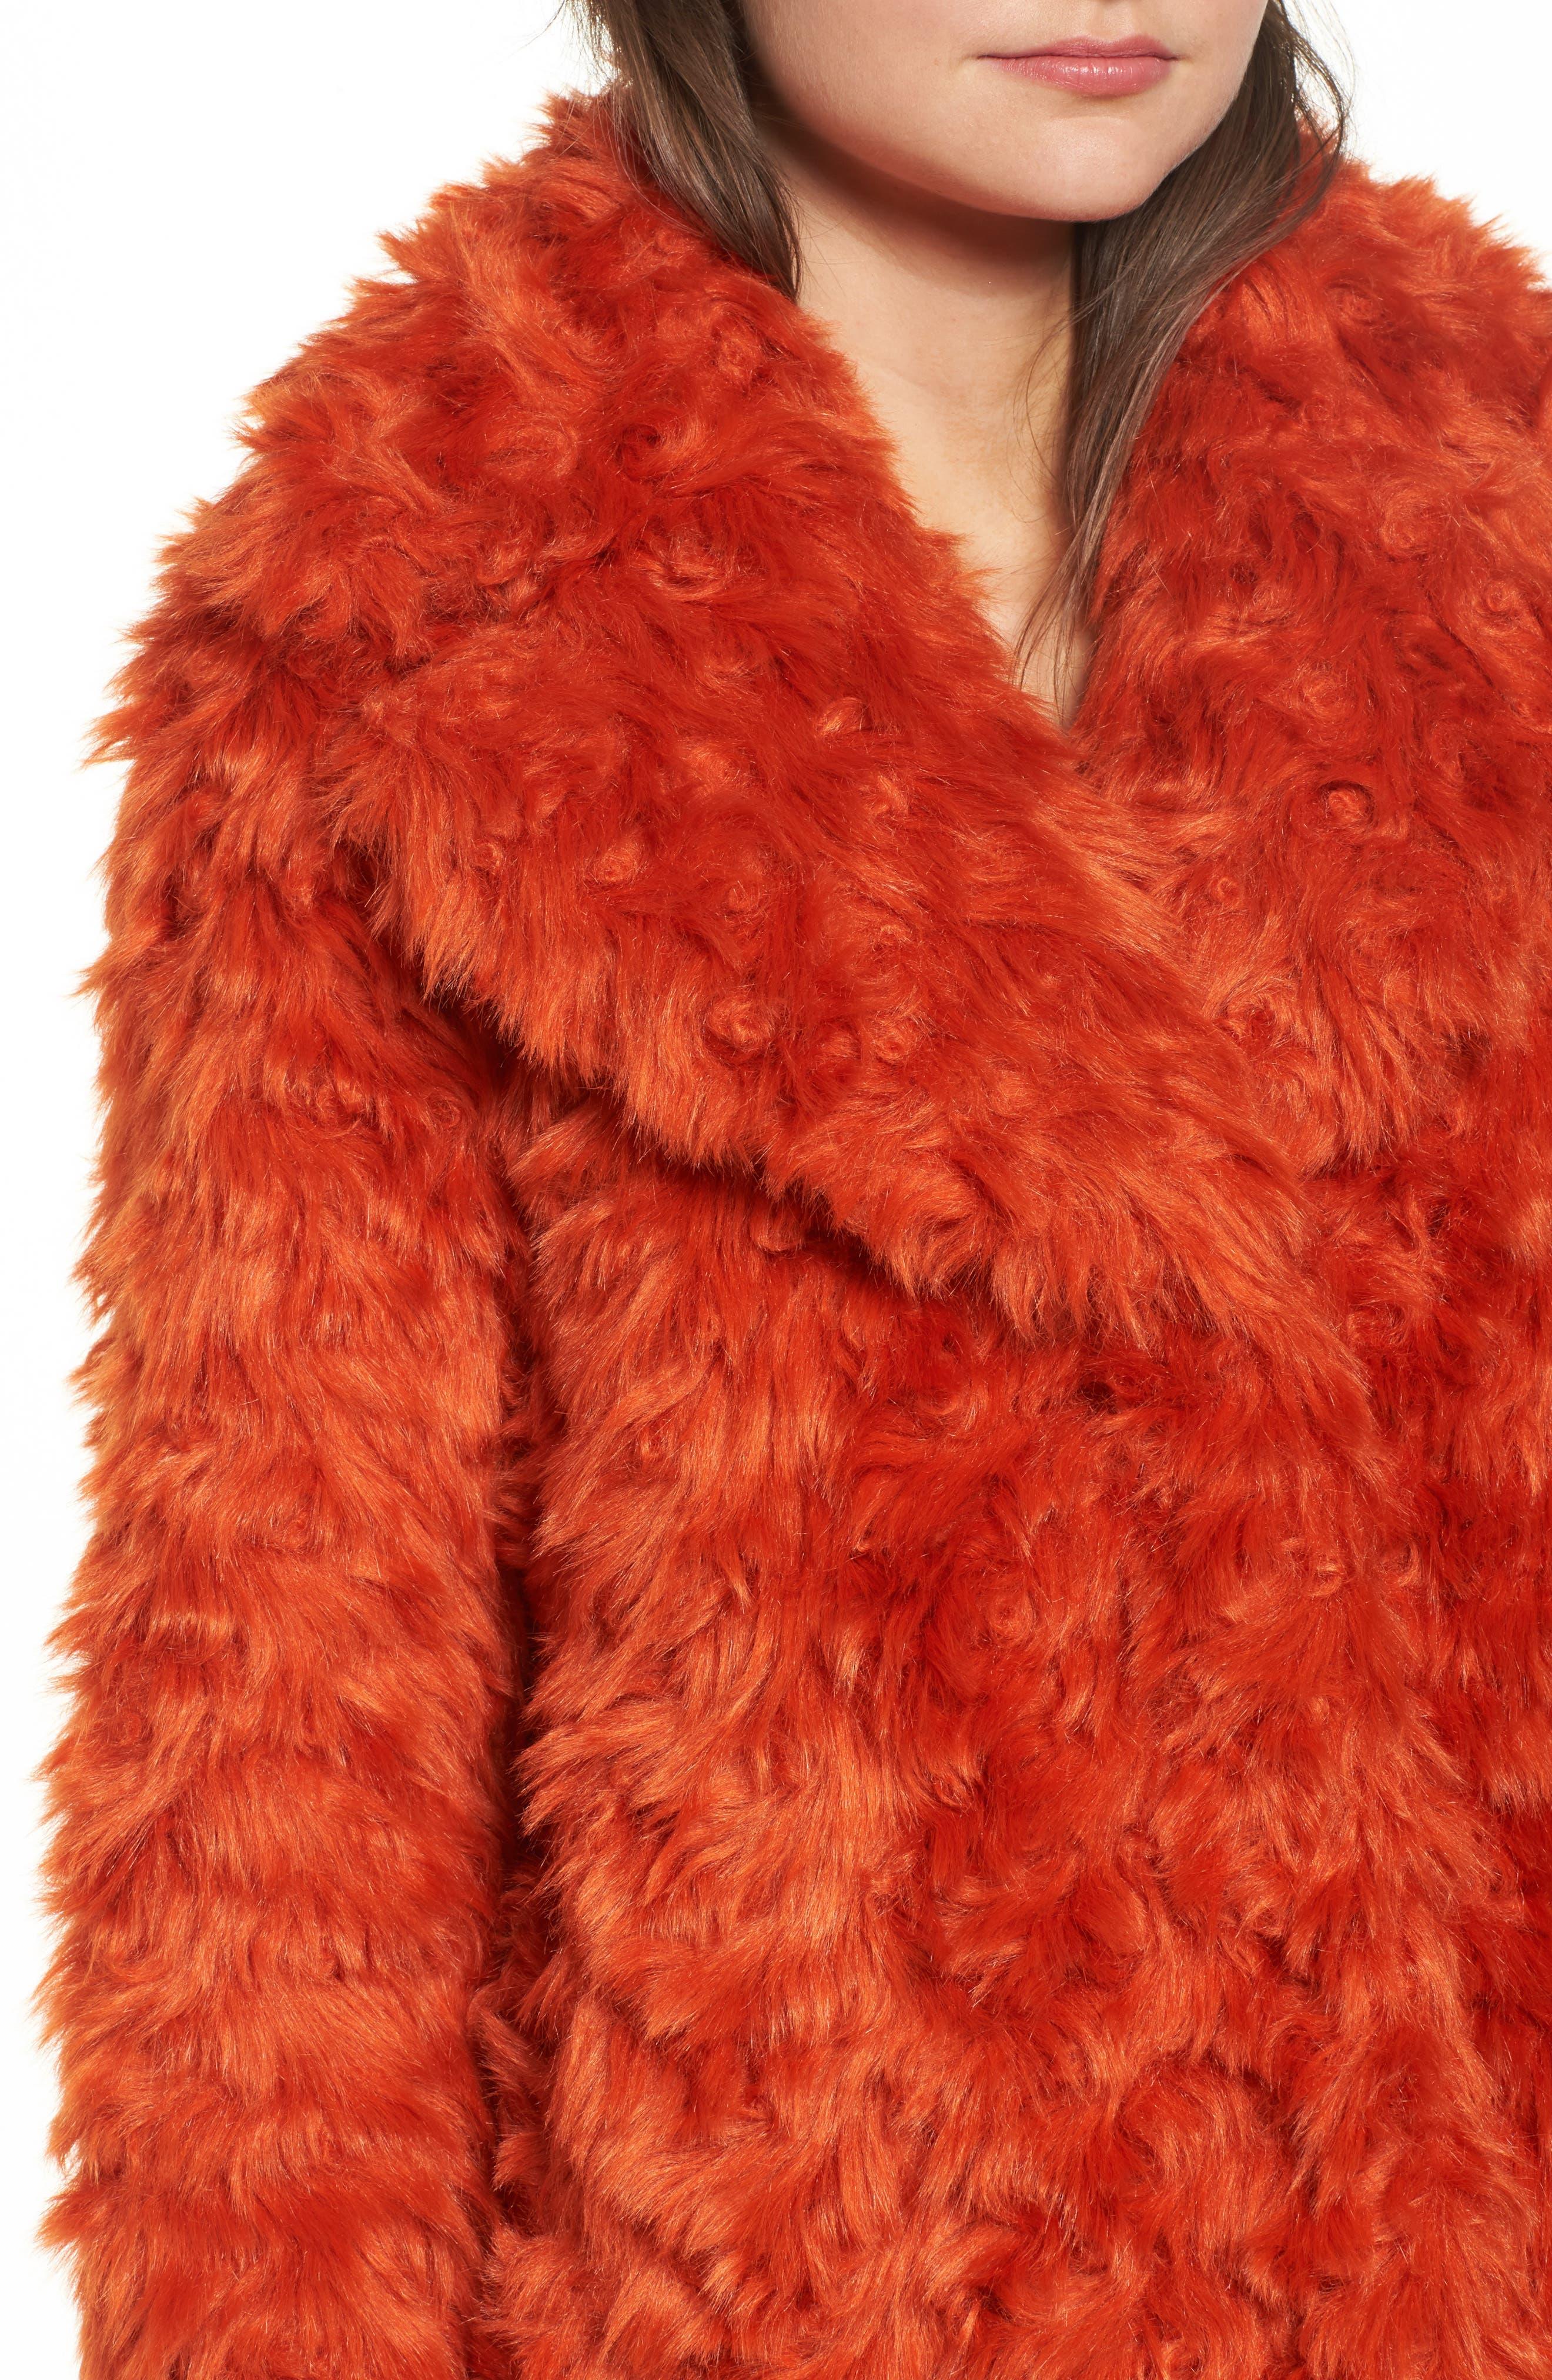 Curly Faux Fur Jacket,                             Alternate thumbnail 4, color,                             800